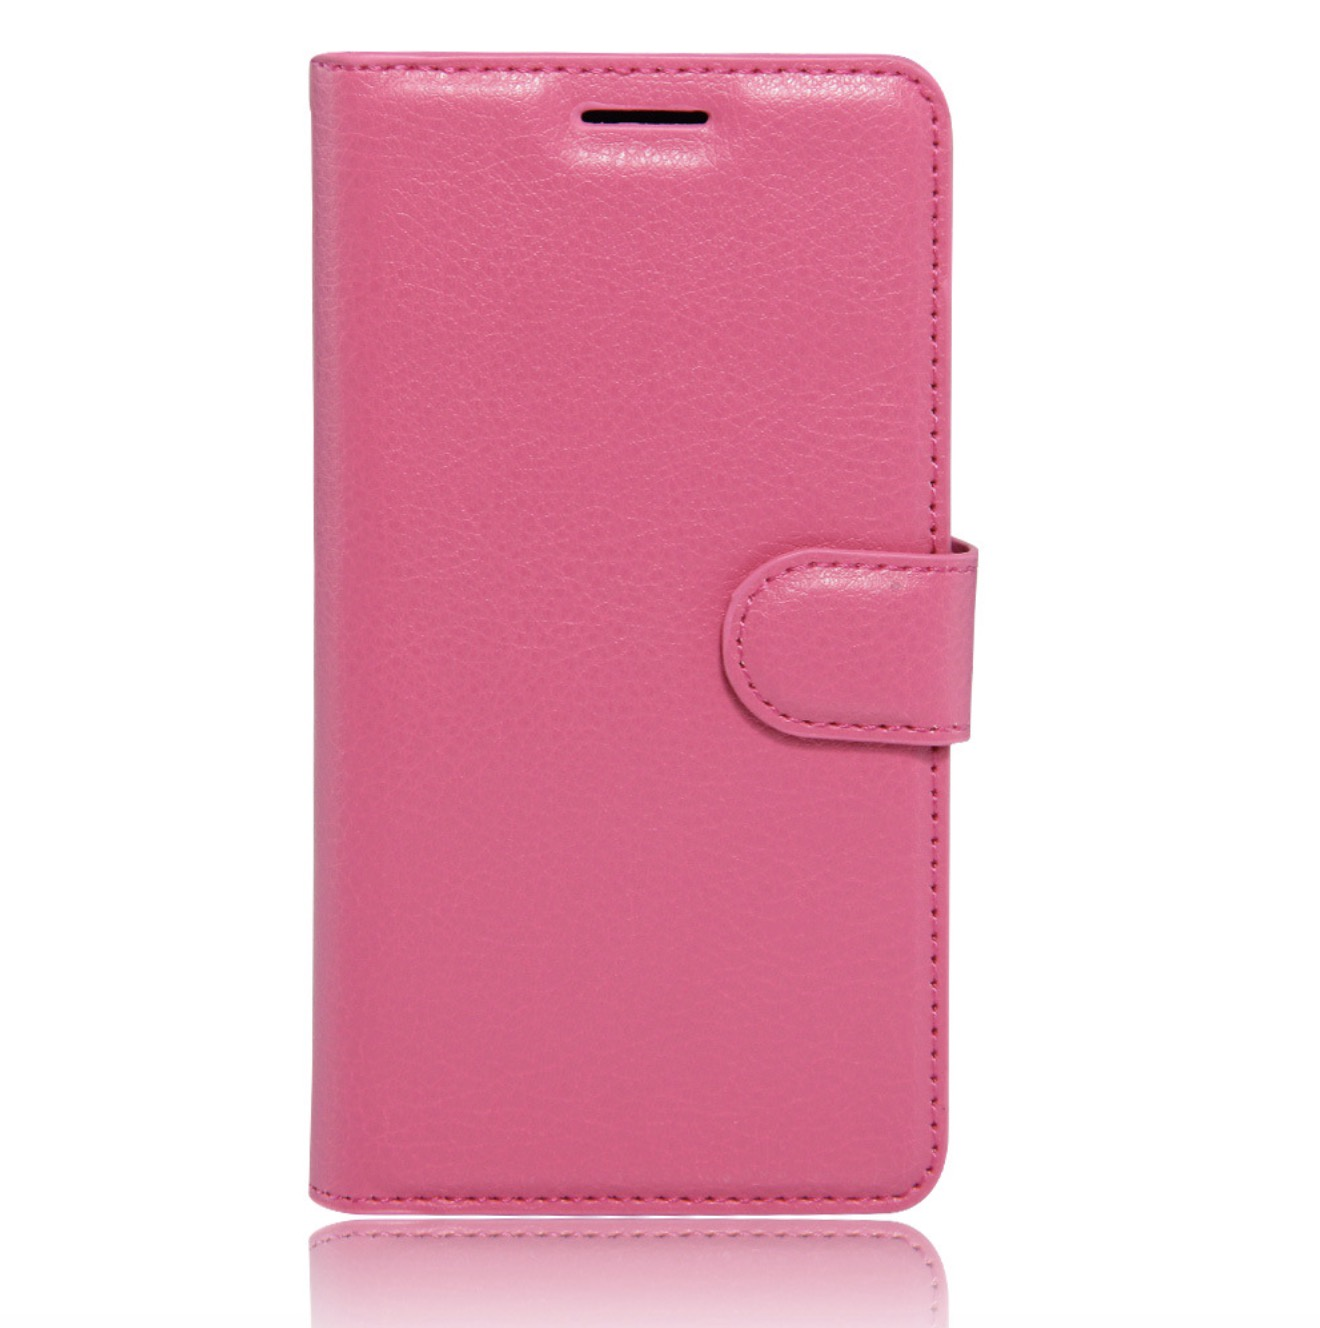 "Чехол-книжка MyPads для Sony Xperia XA / XA Dual 5.0"" (F3113/ F3112 / F3115 /E6533) с мульти-подставкой застёжкой и визитницей розовый"